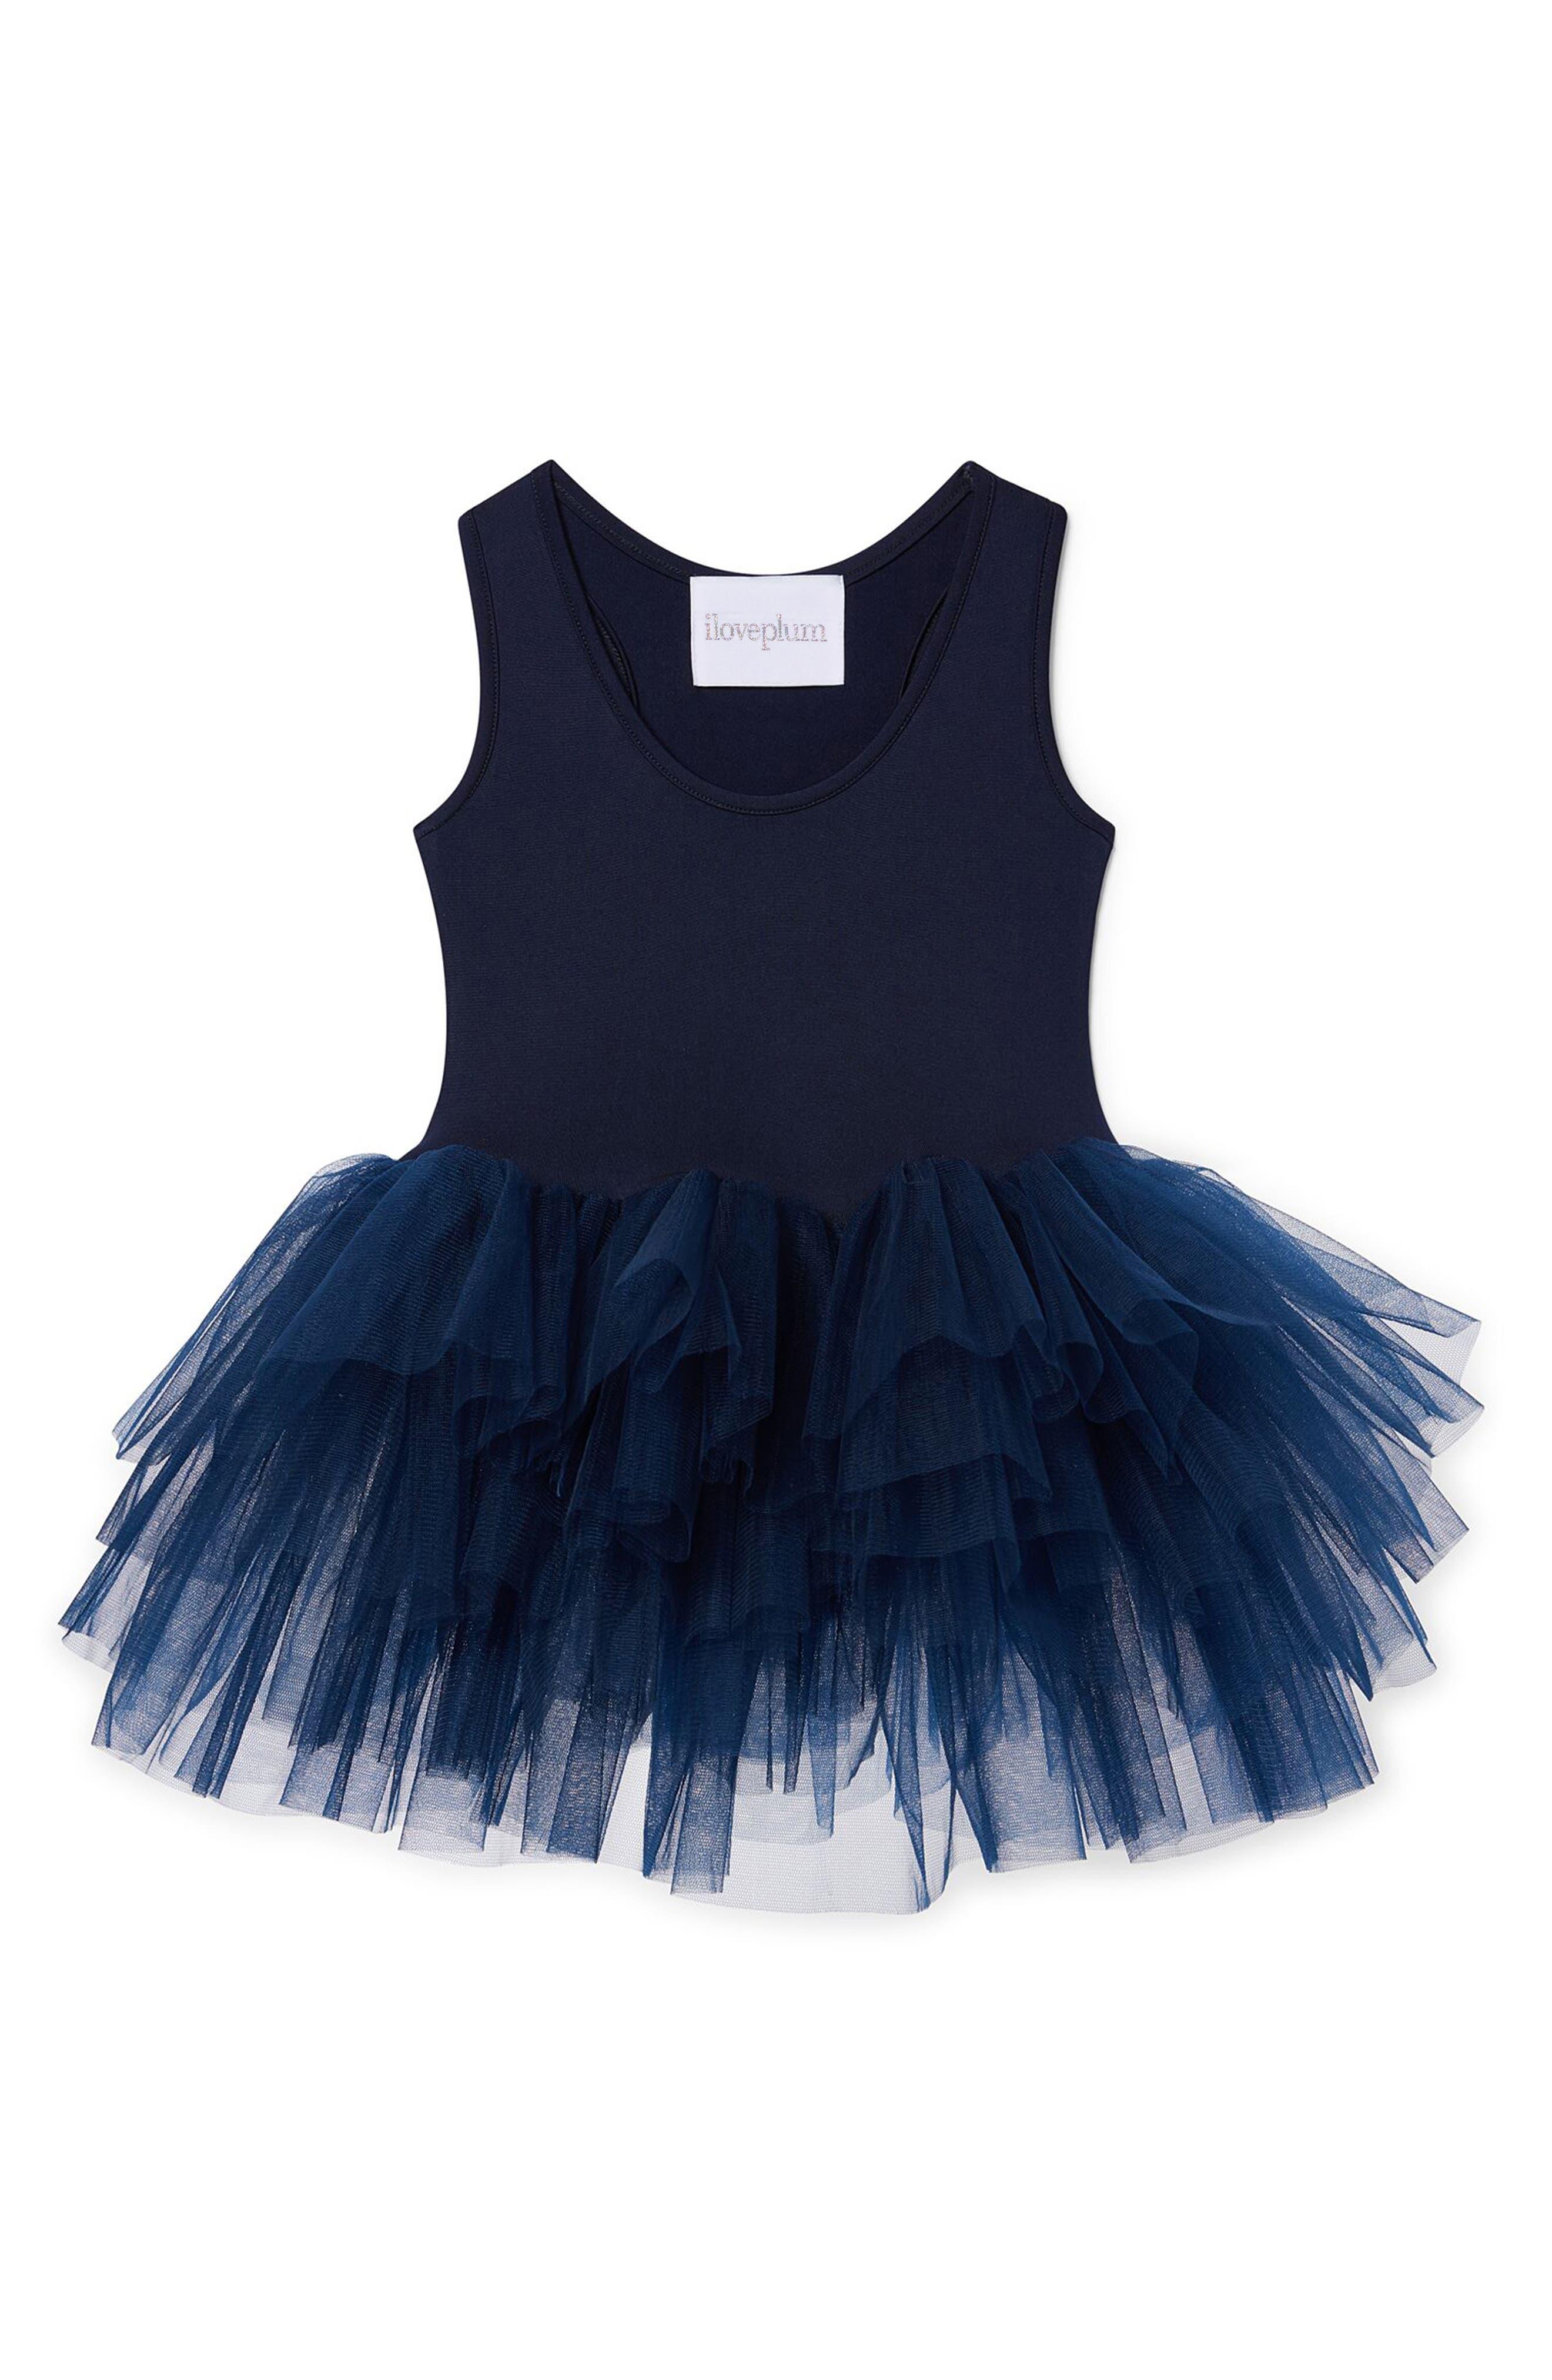 Tutu Dress,                         Main,                         color, Navy Blue